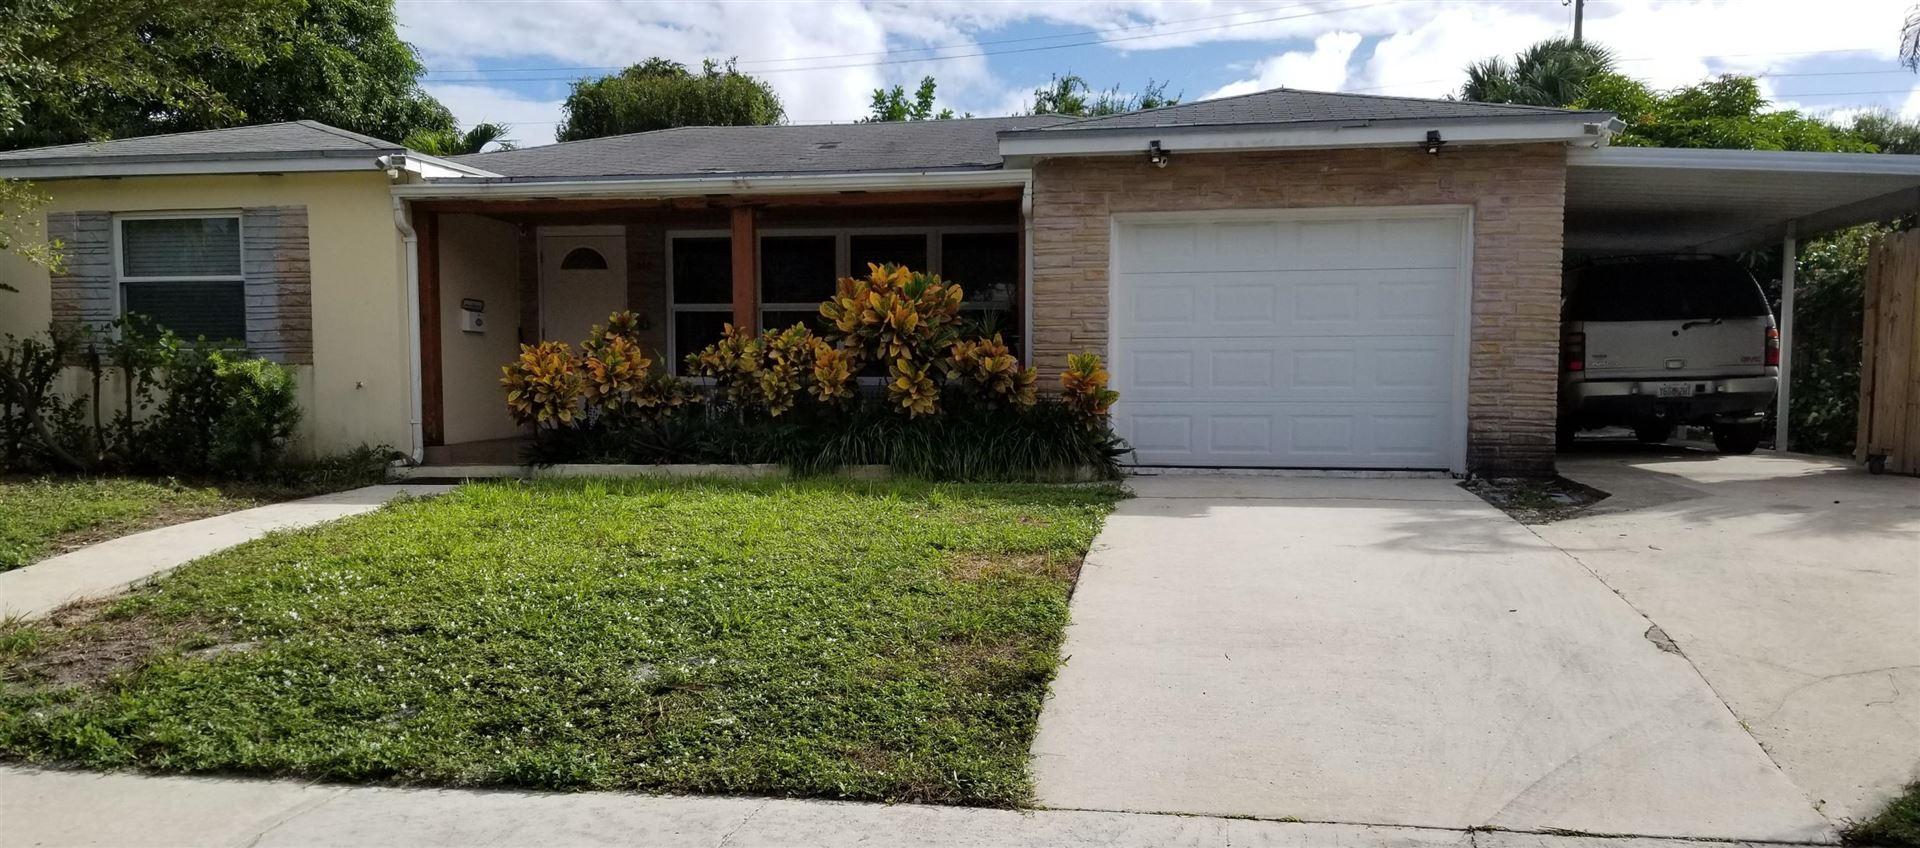 310 28th Street, West Palm Beach, FL 33407 - #: RX-10665002